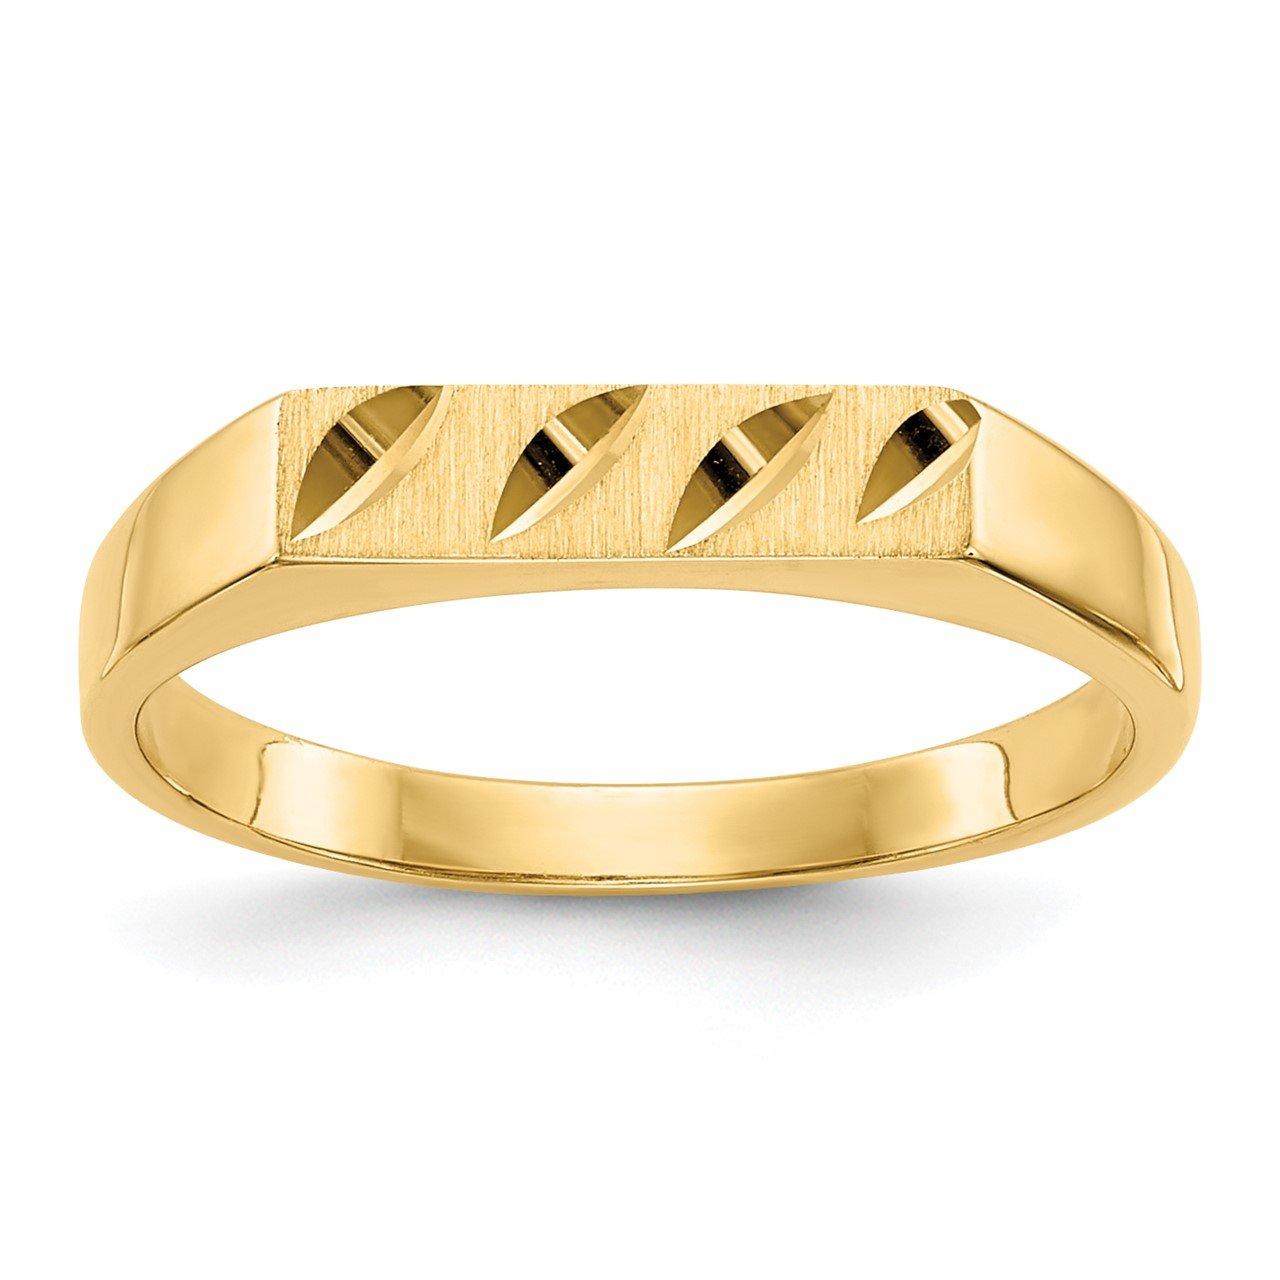 14k Childs Diamond-Cut Ring